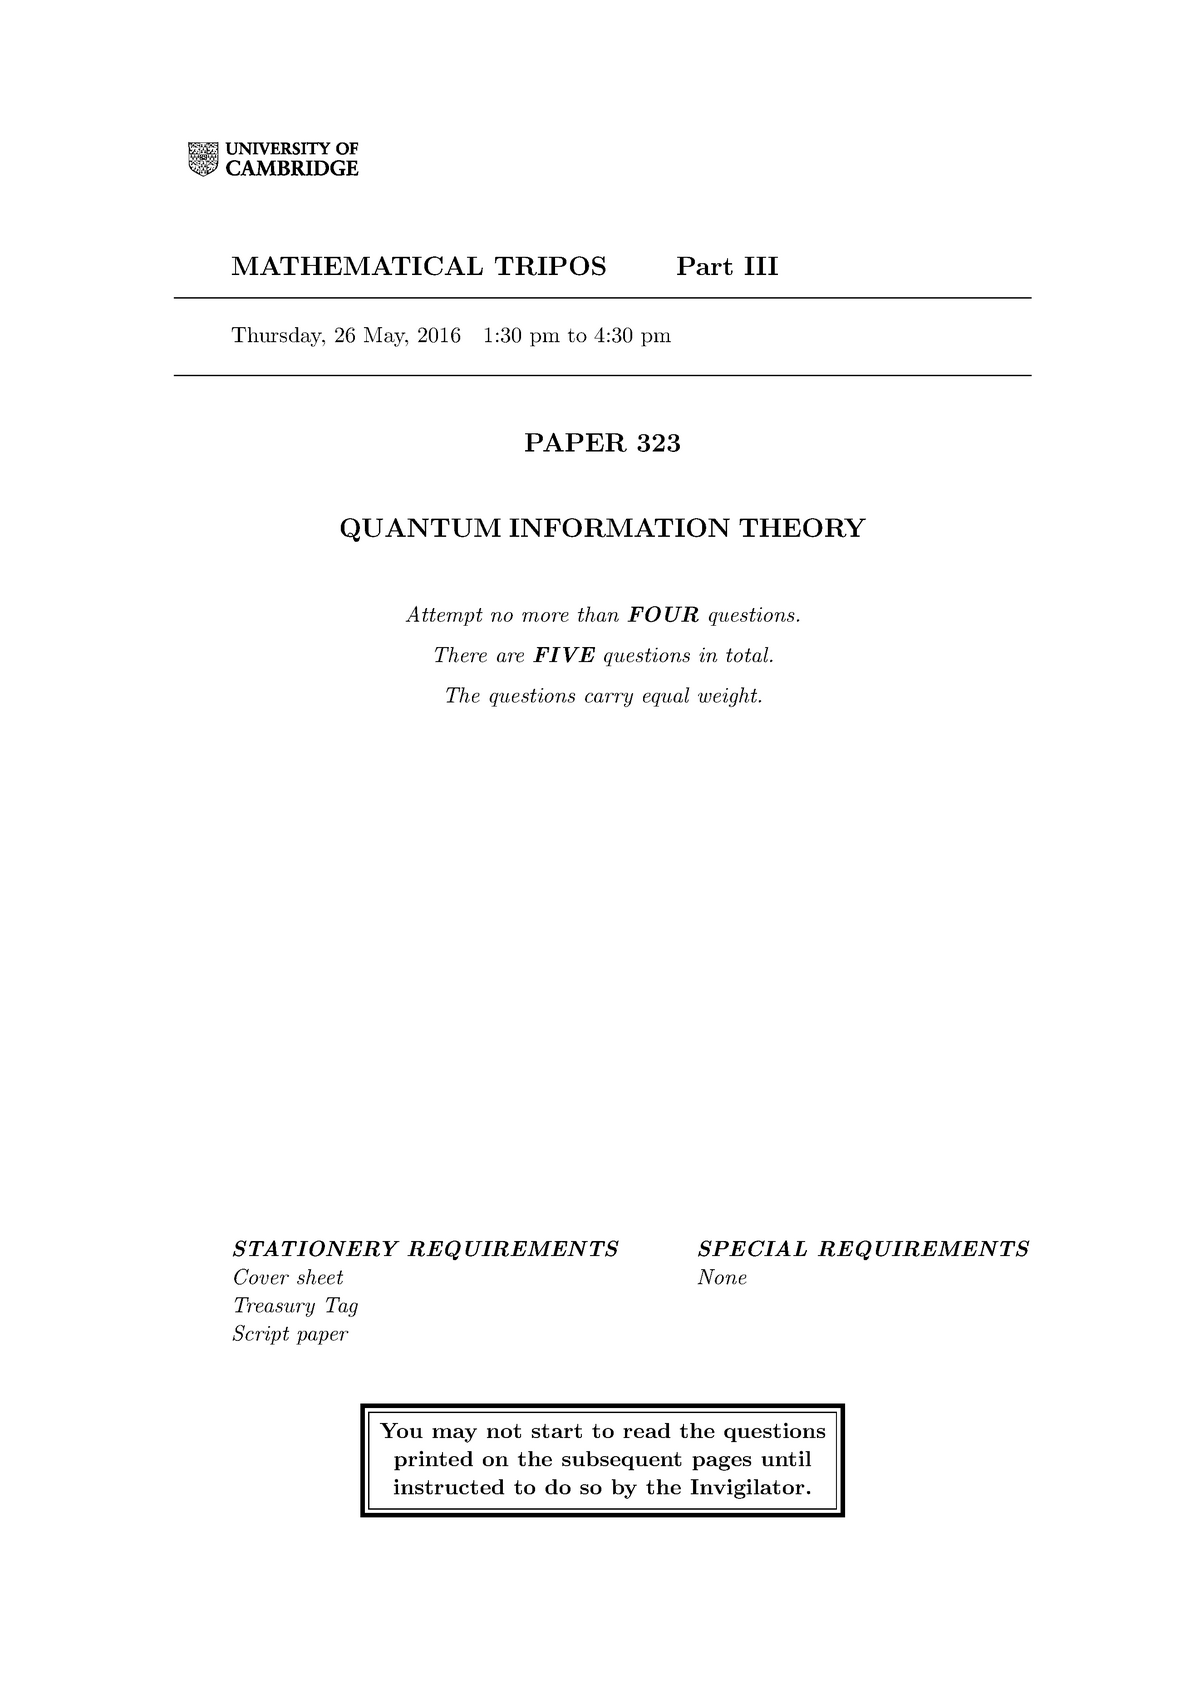 Exam 2016 - Quantum Information Theory - StuDocu